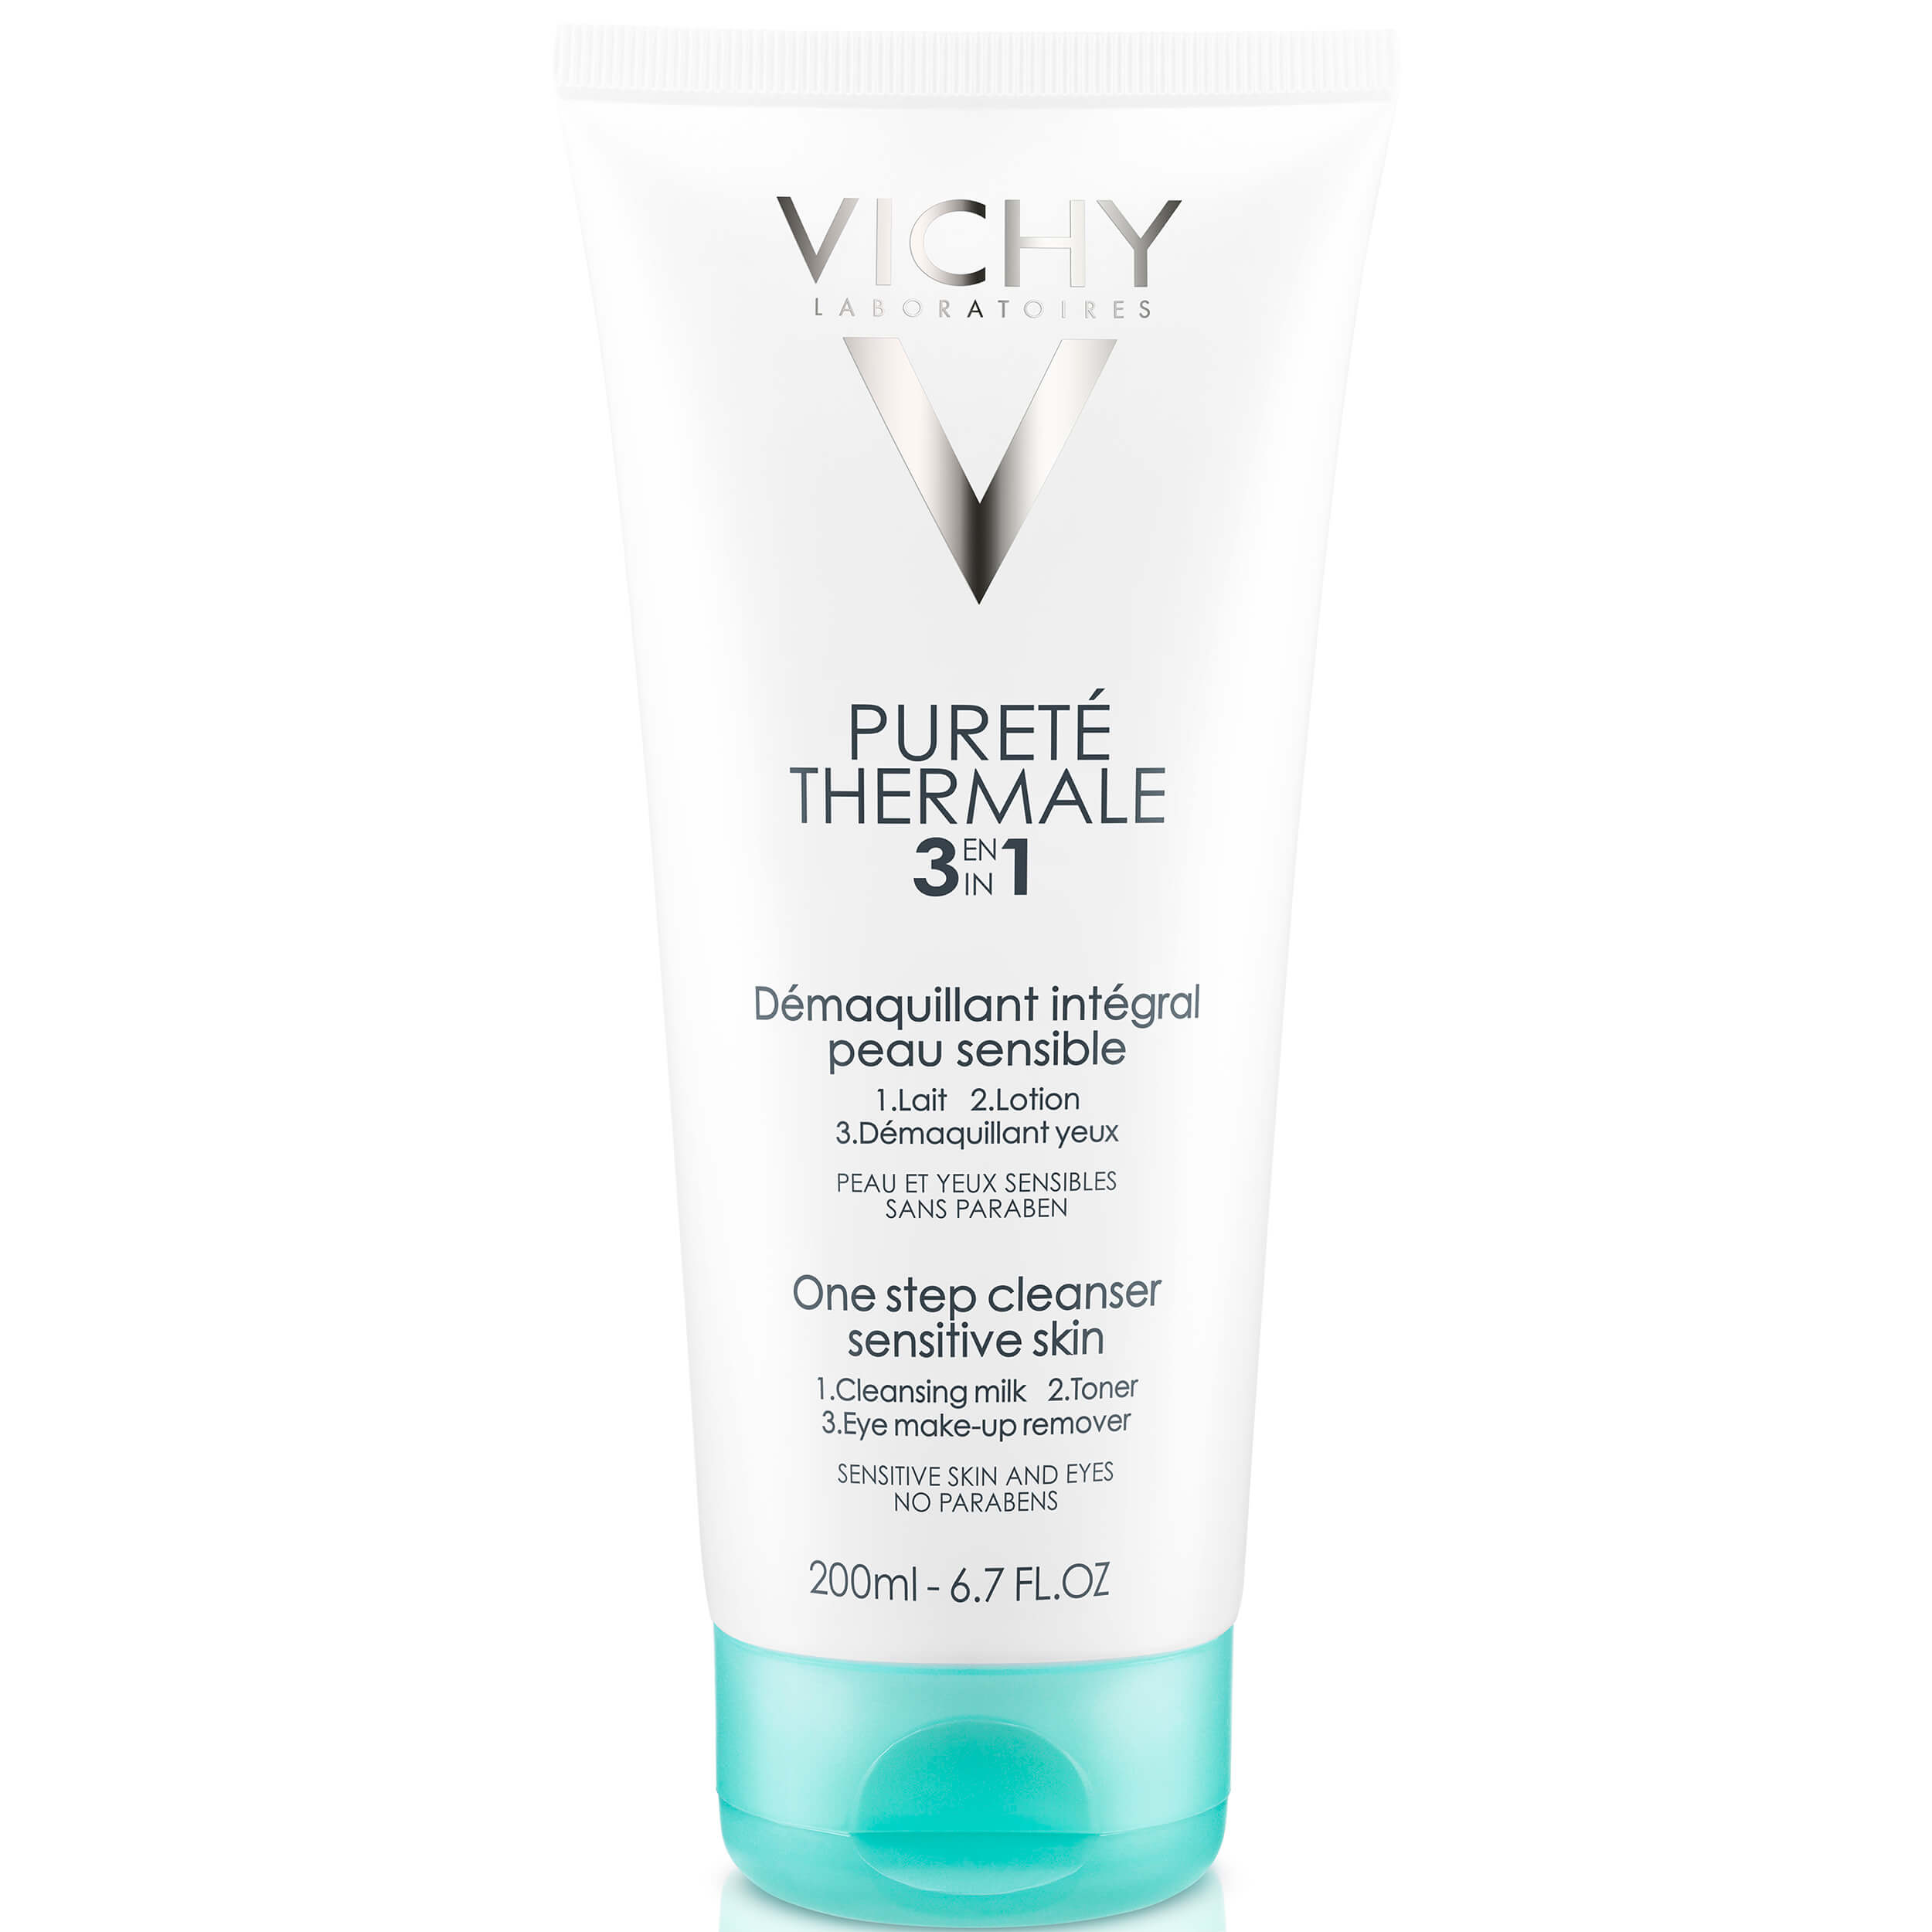 Vichy Purete Thermale Integral Γαλάκτωμα Καθαρισμού, Τονωτική Λοσιόν & Ντεμακιγιάζ Ματιών 3 σε1 – 200ml